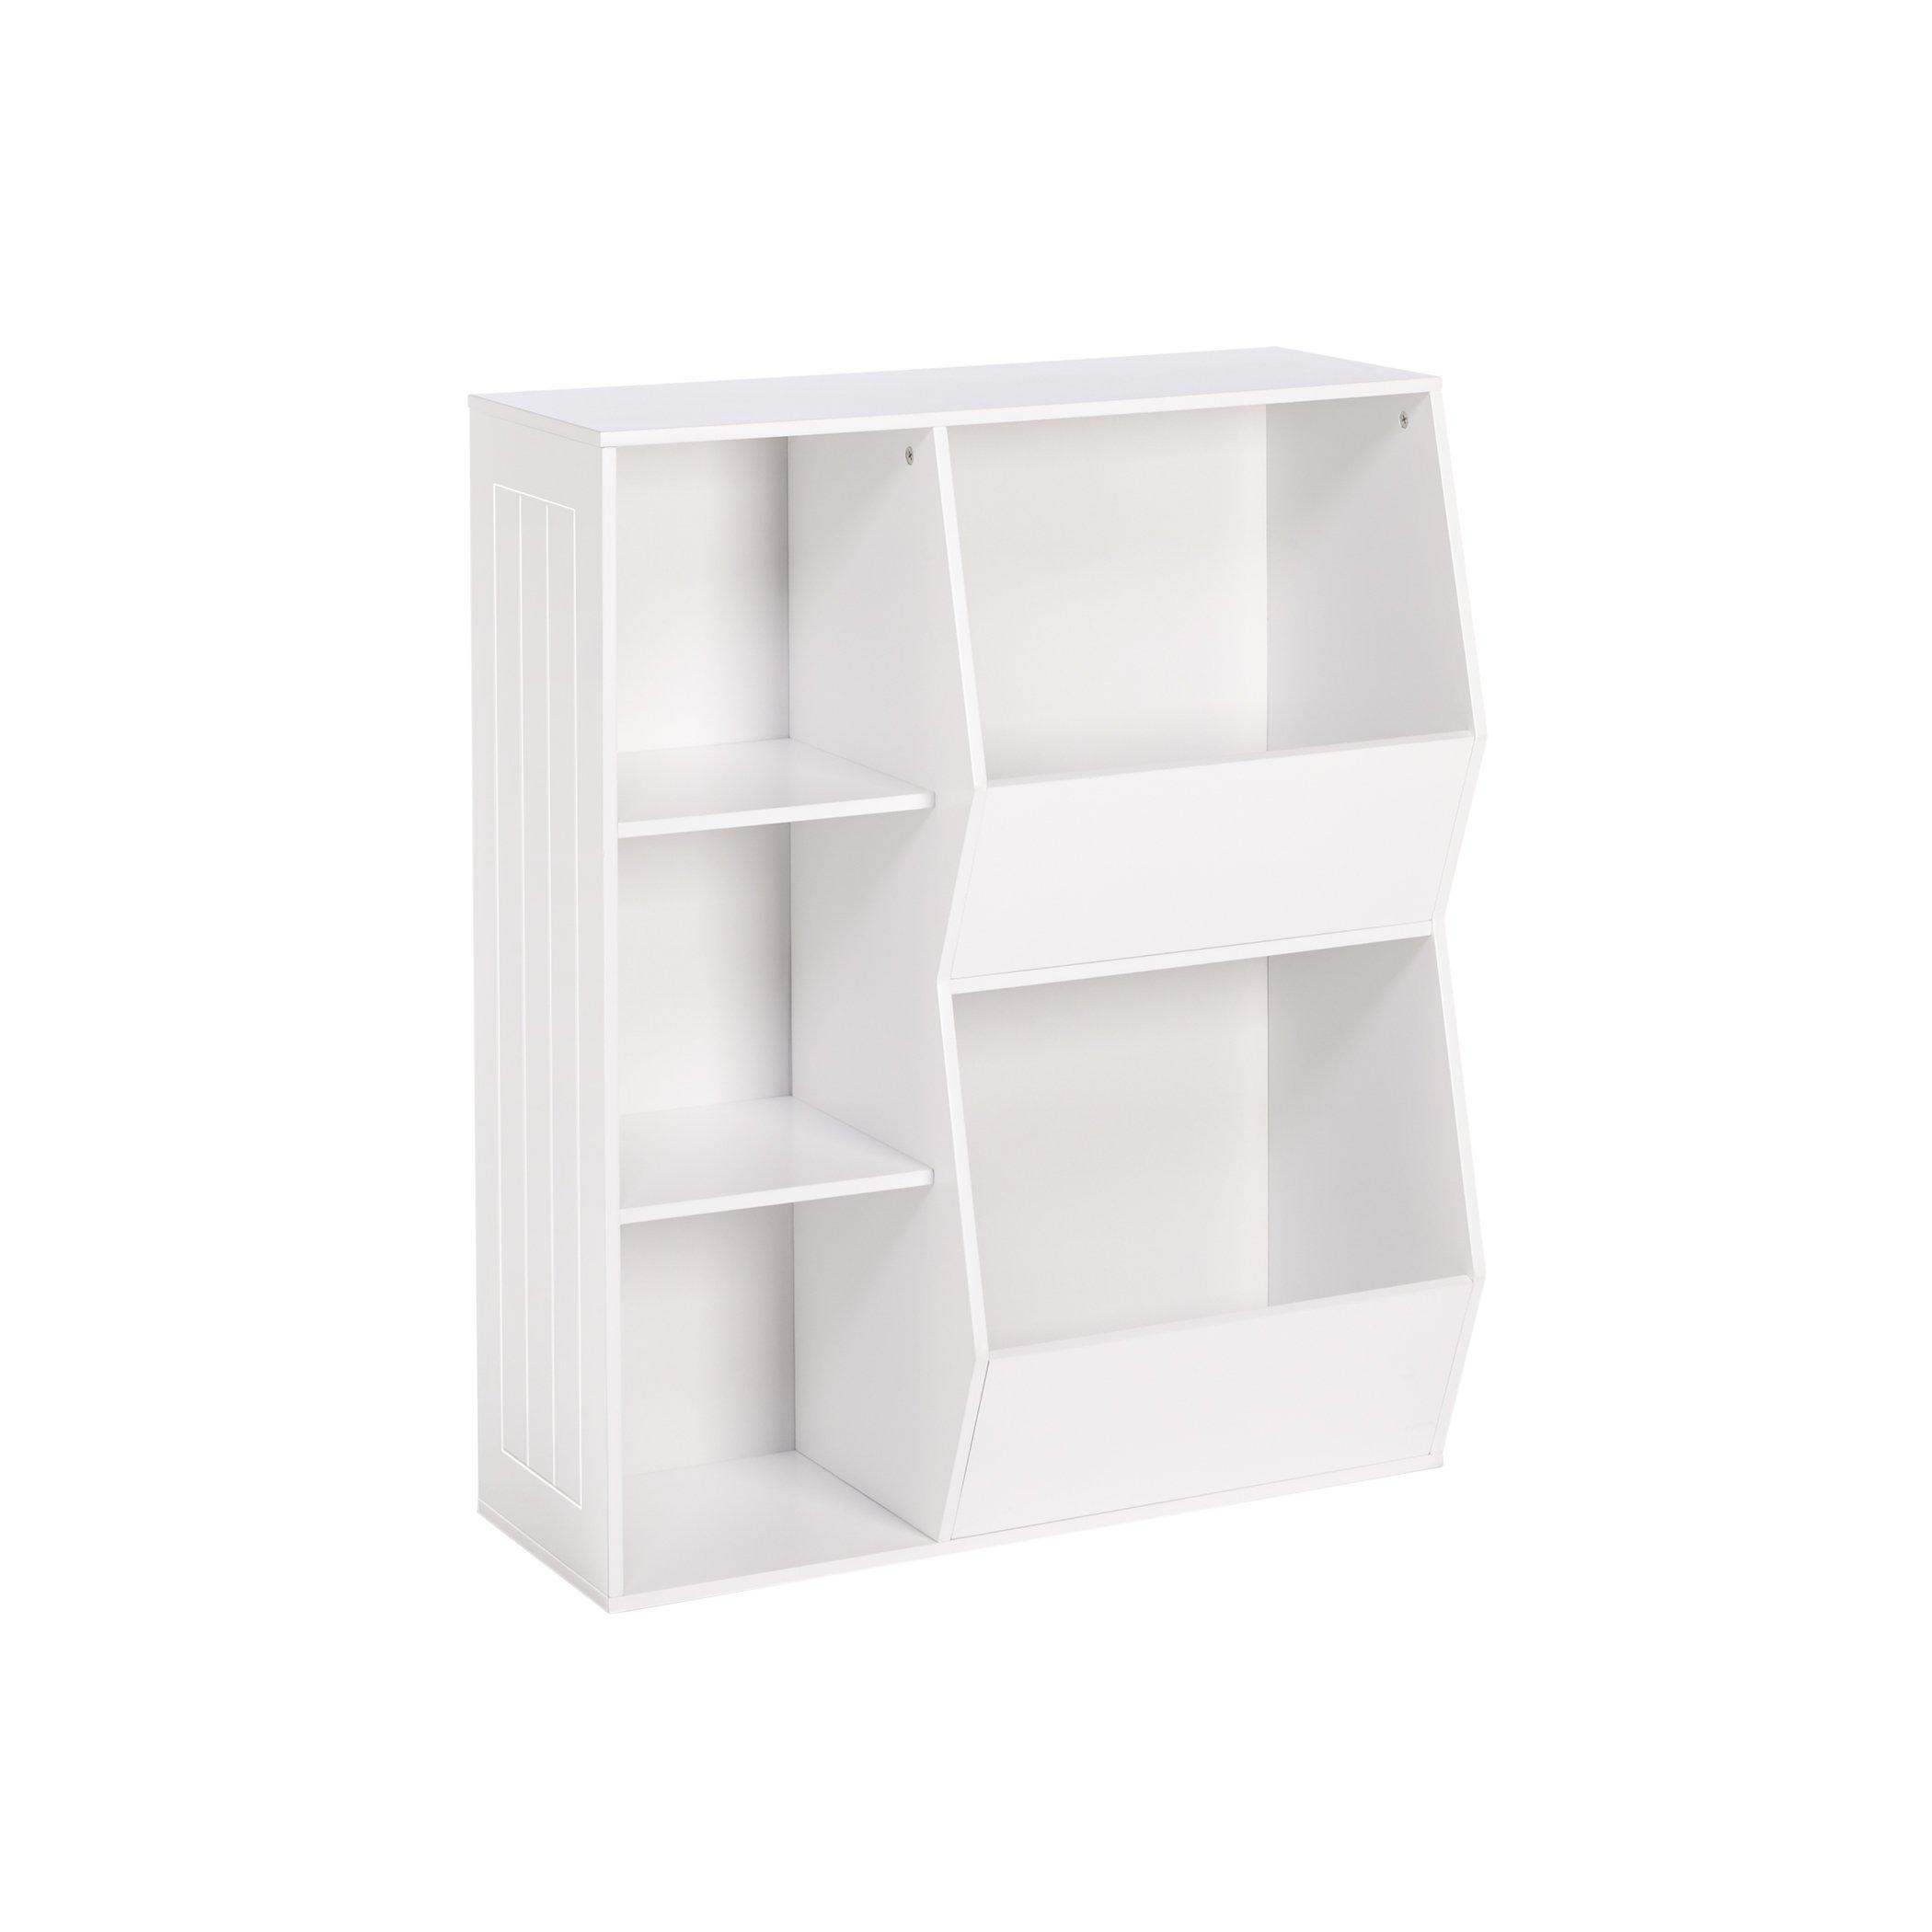 RiverRidge Kids 02-146 3-Cubby/2-Veggie Bin Floor Cabinet, White